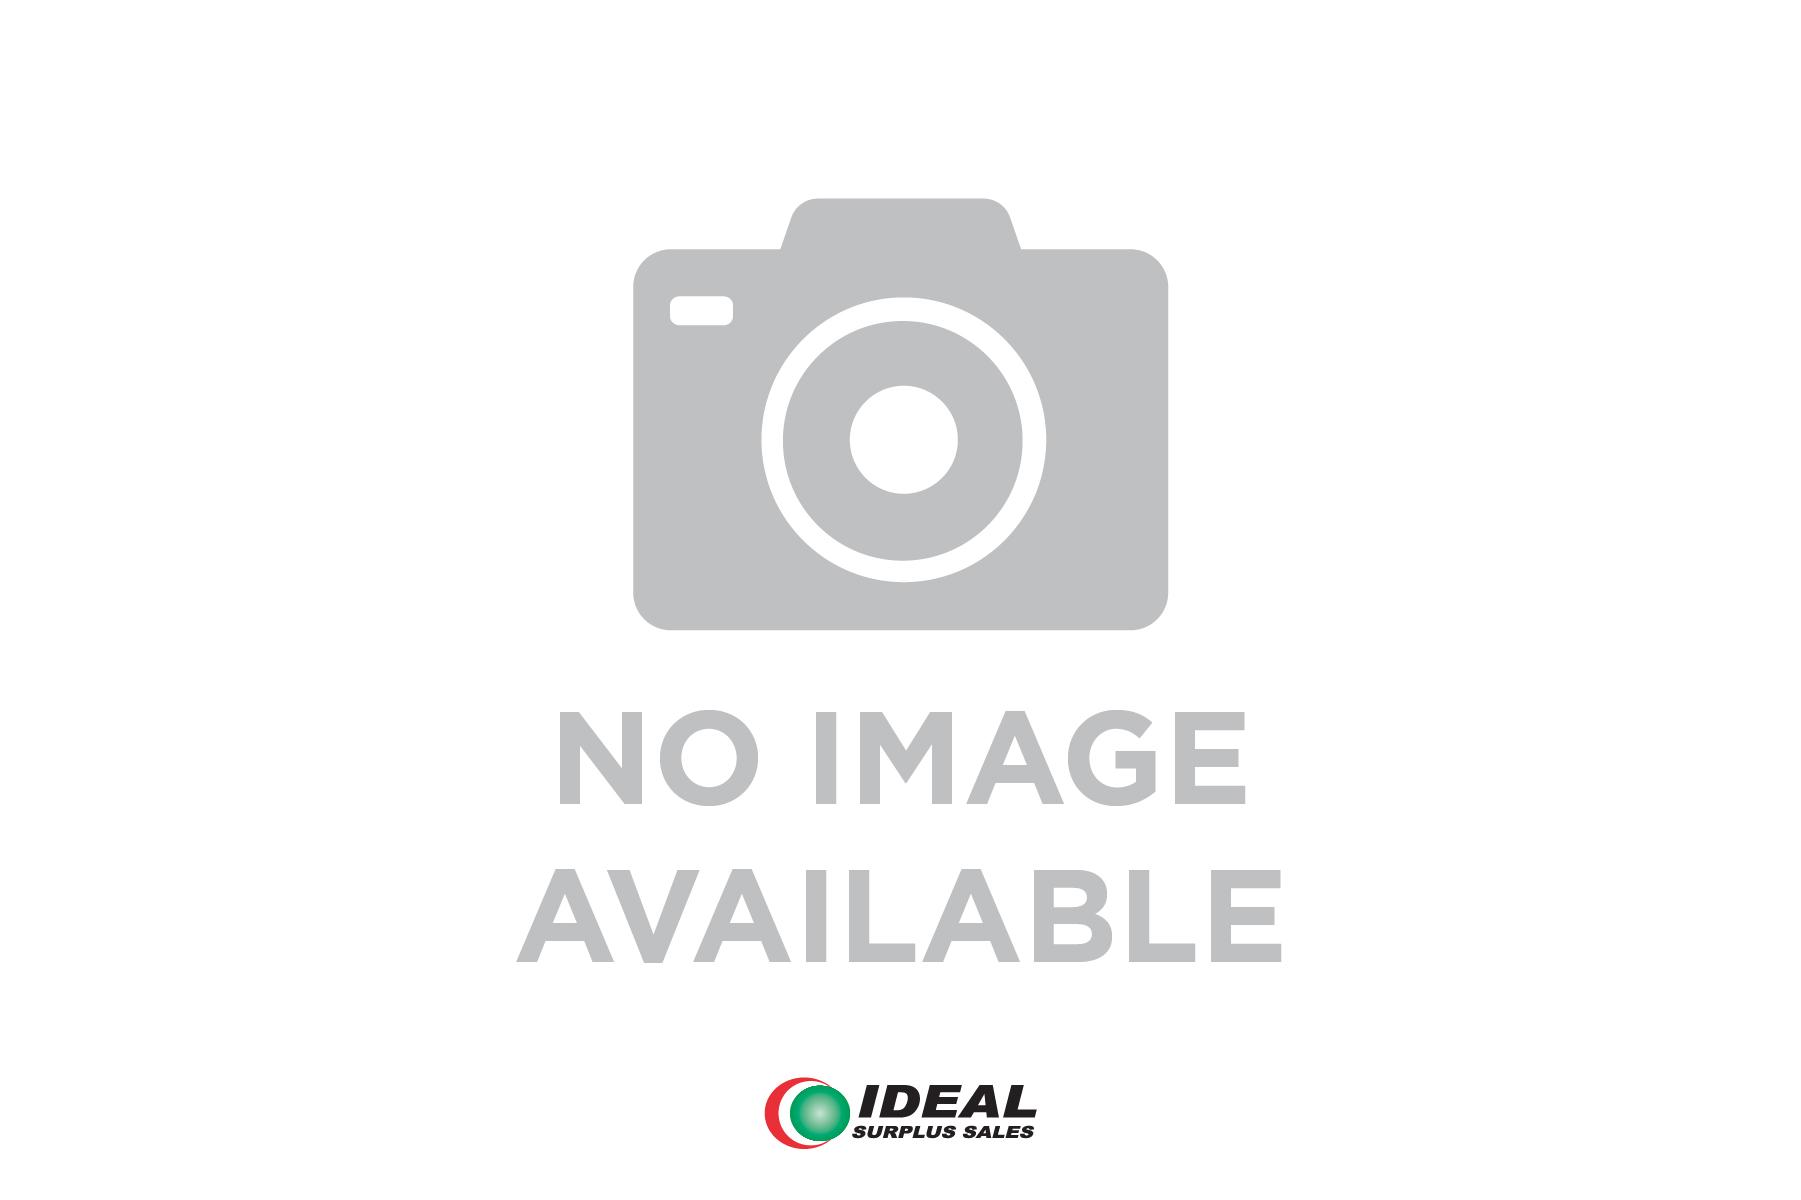 Telemecanique XVALC3 Clear Lens Stack Light  USED